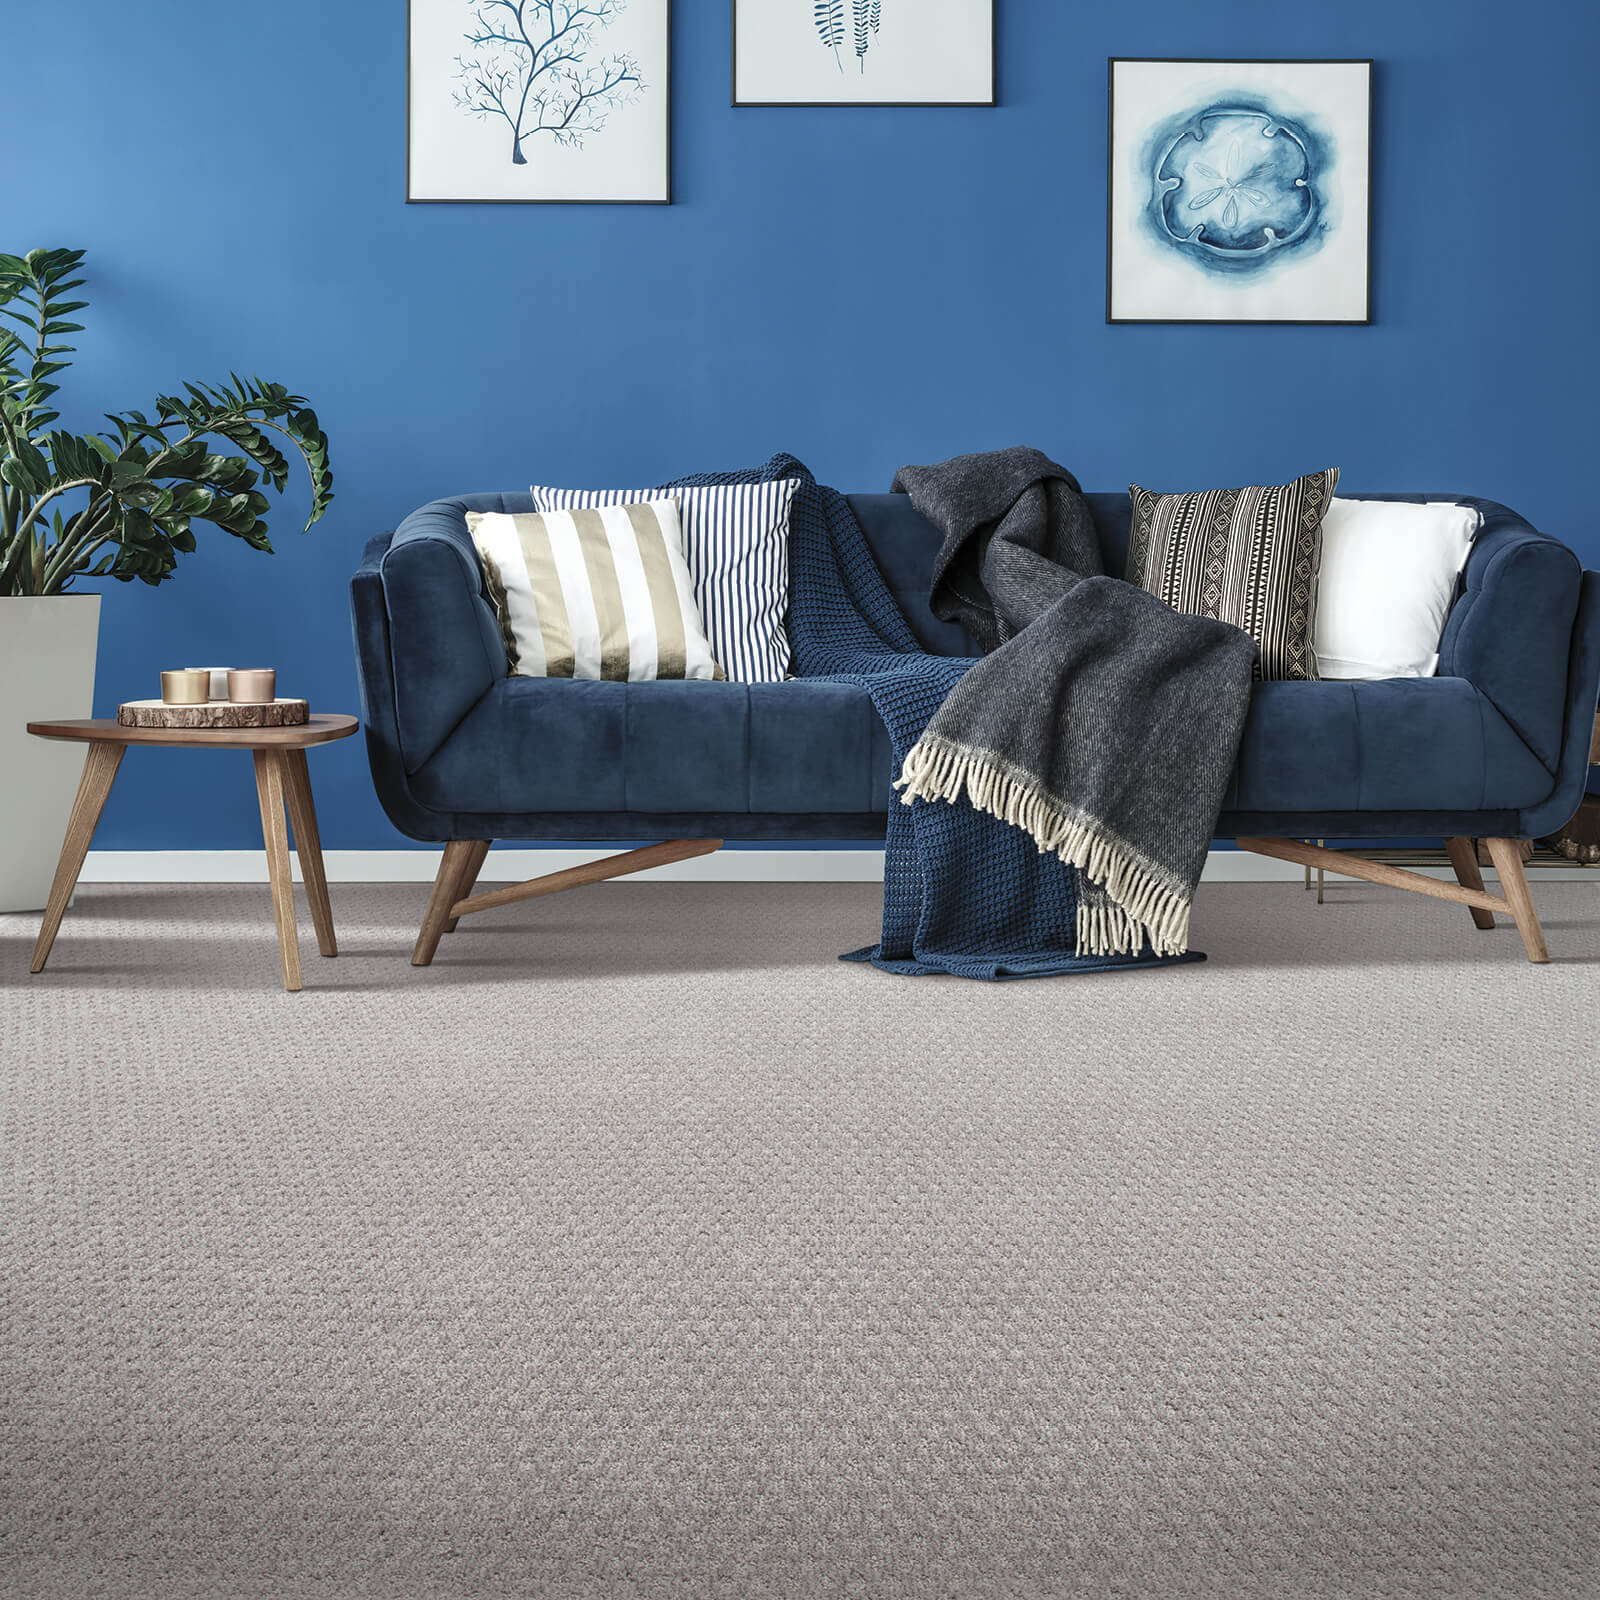 Blue colorwall | Dolphin Carpet & Tile